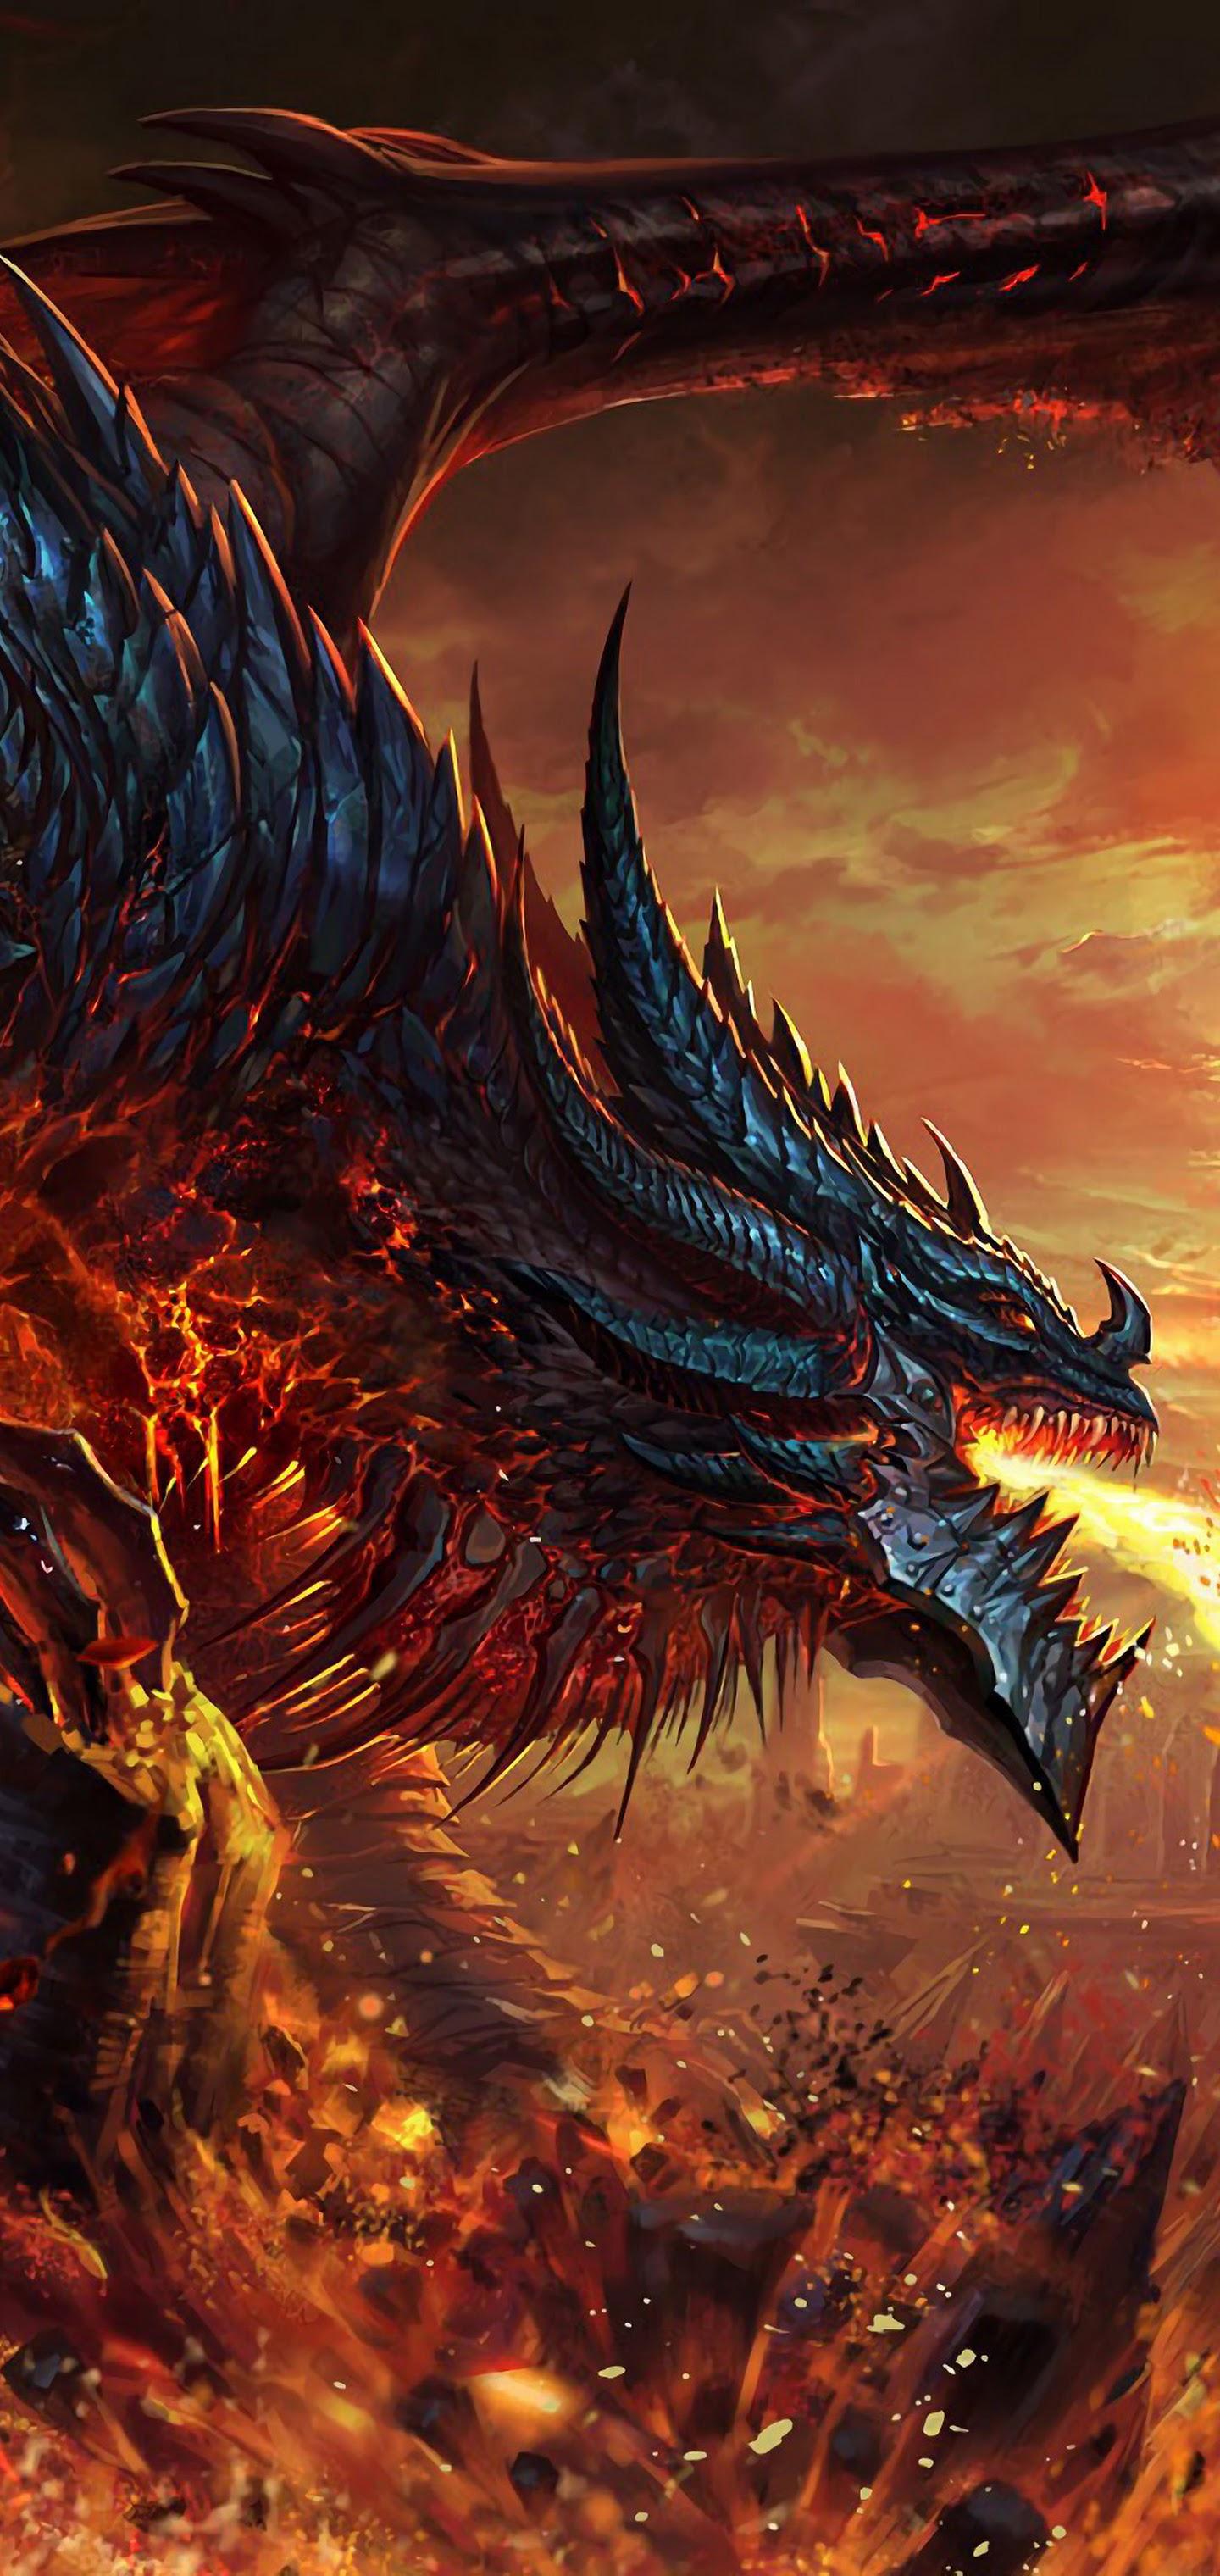 dragon fire breath fantasy uhdpaper.com 4K 73